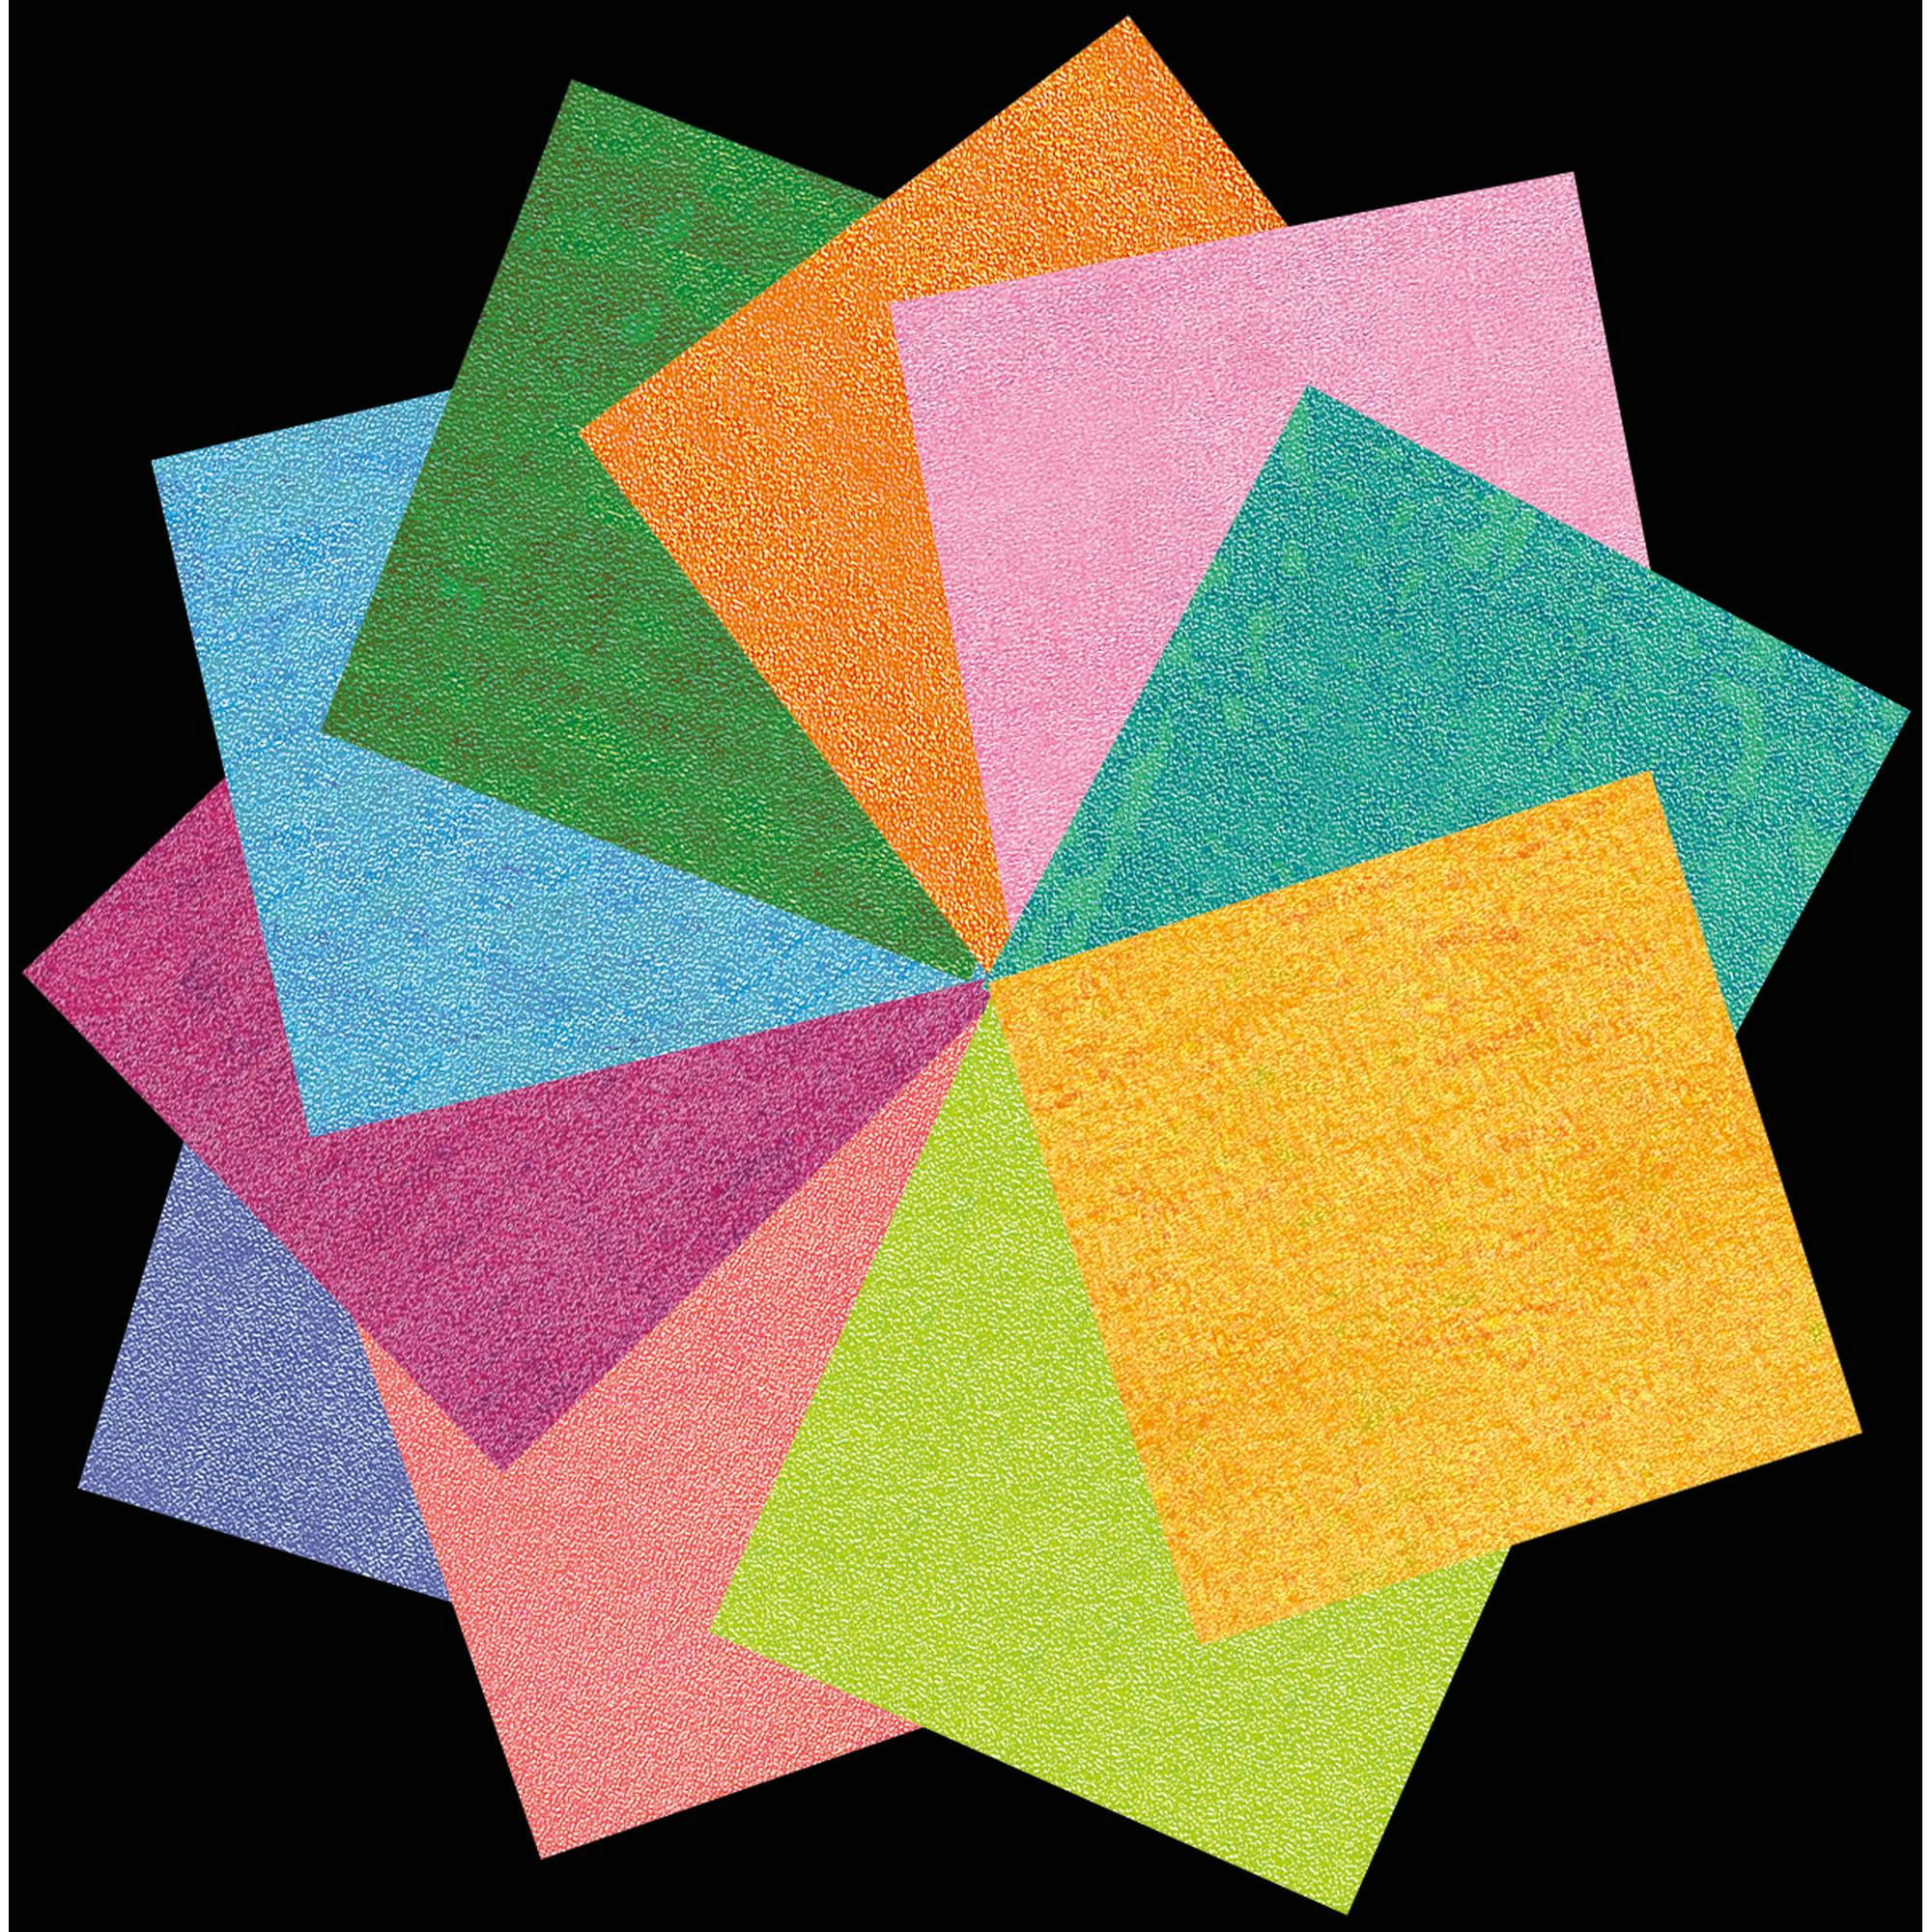 Piegami – Origami Inspired Container – leandra eibl portfolio | 2000x2000